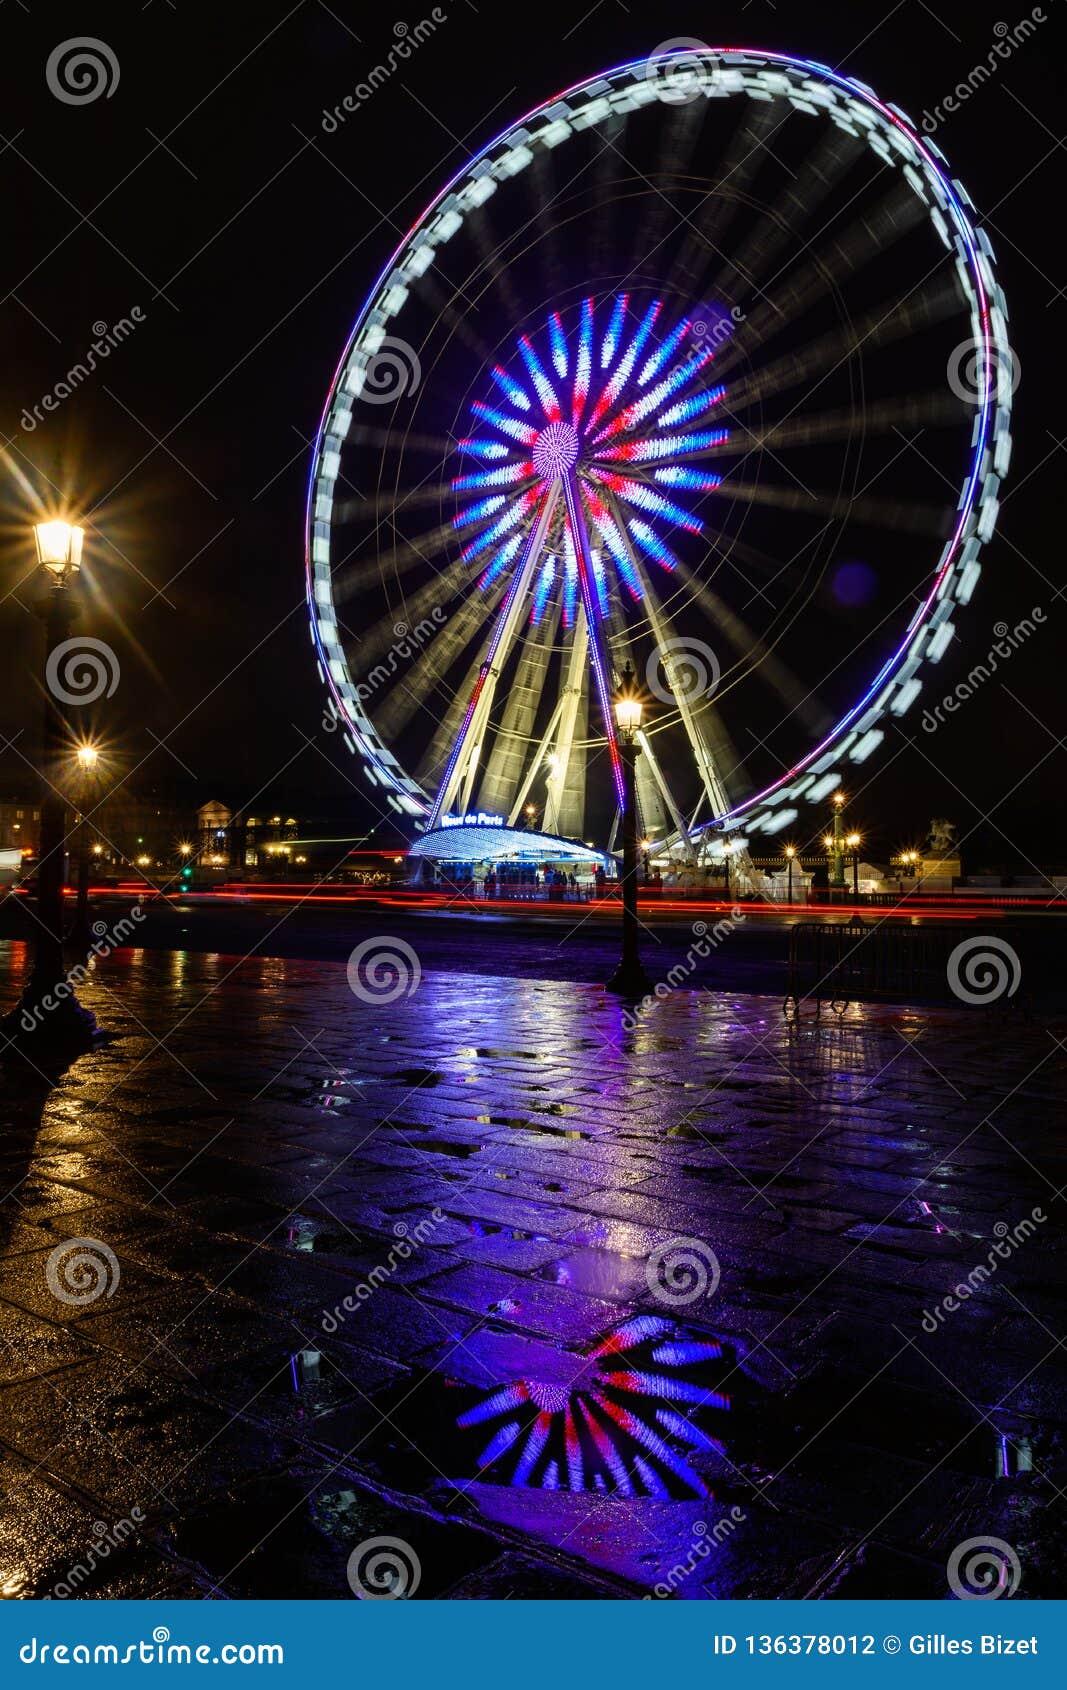 Night view of illuminated big wheel in Paris